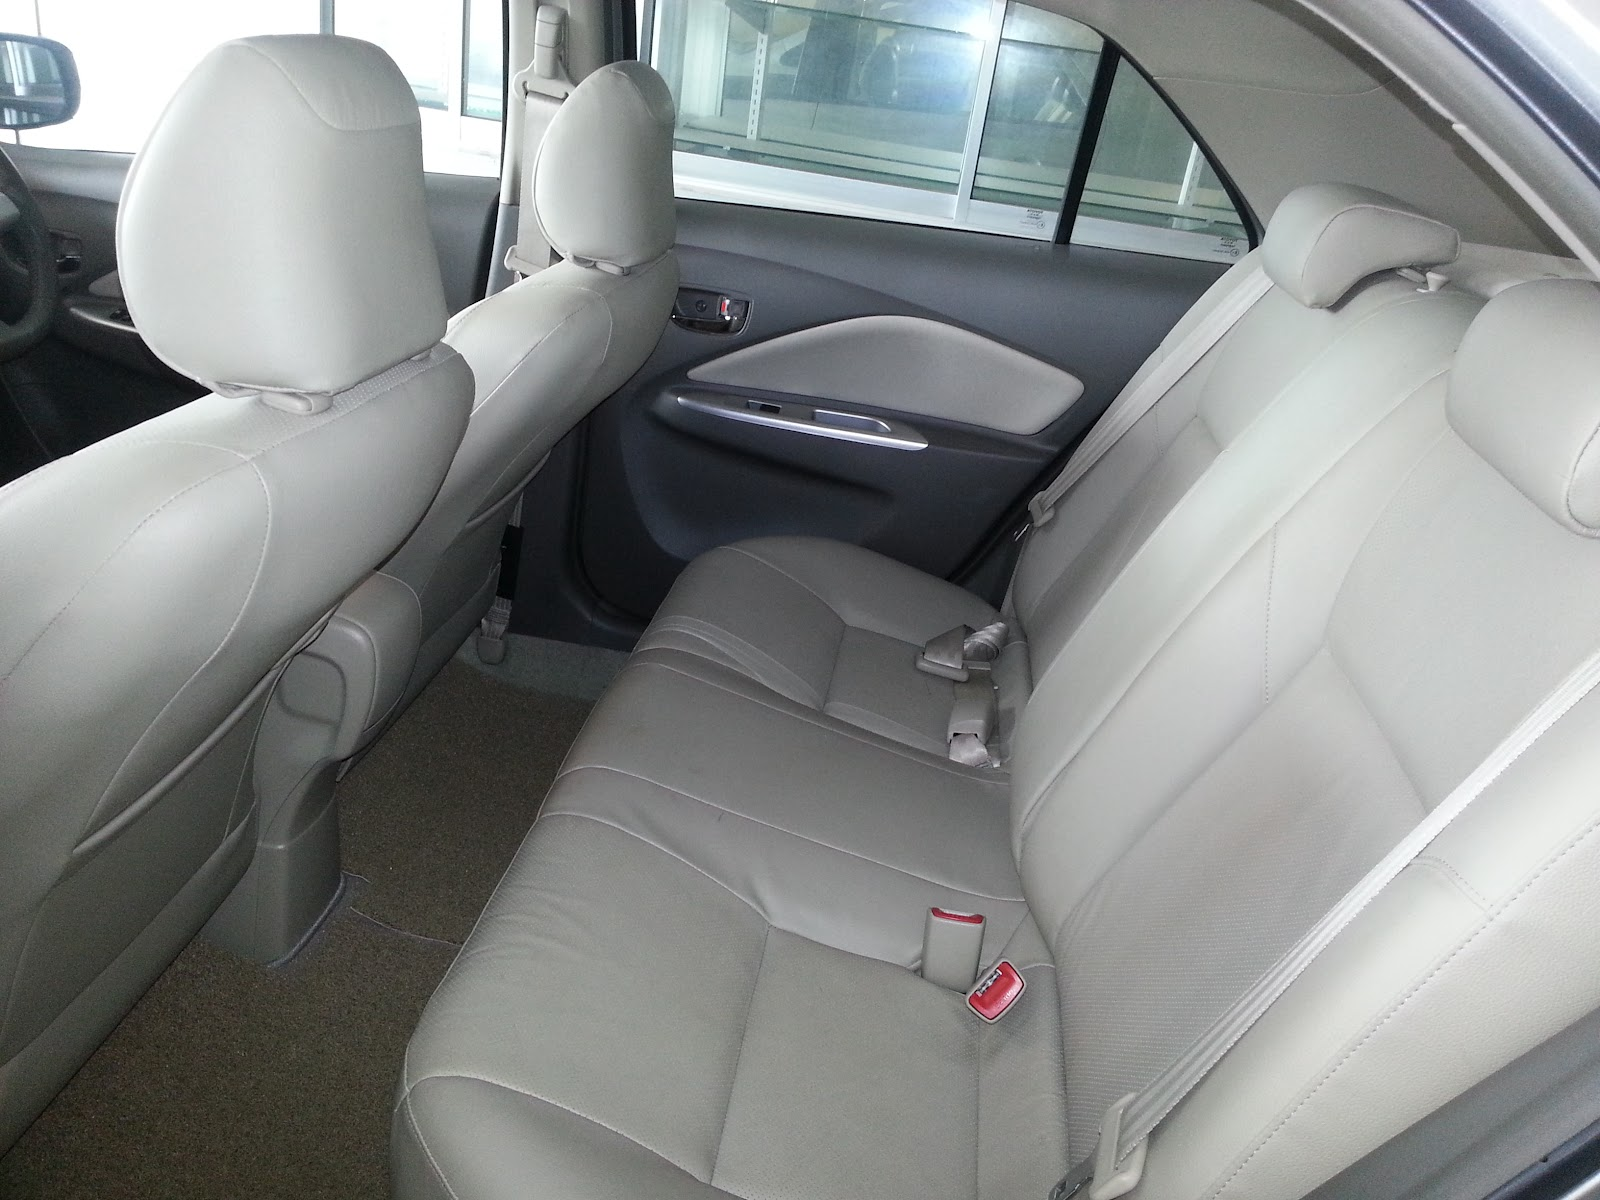 interior grand new avanza 1.3 g veloz olx 2nd car malaysia toyota vios 1 5g a silver